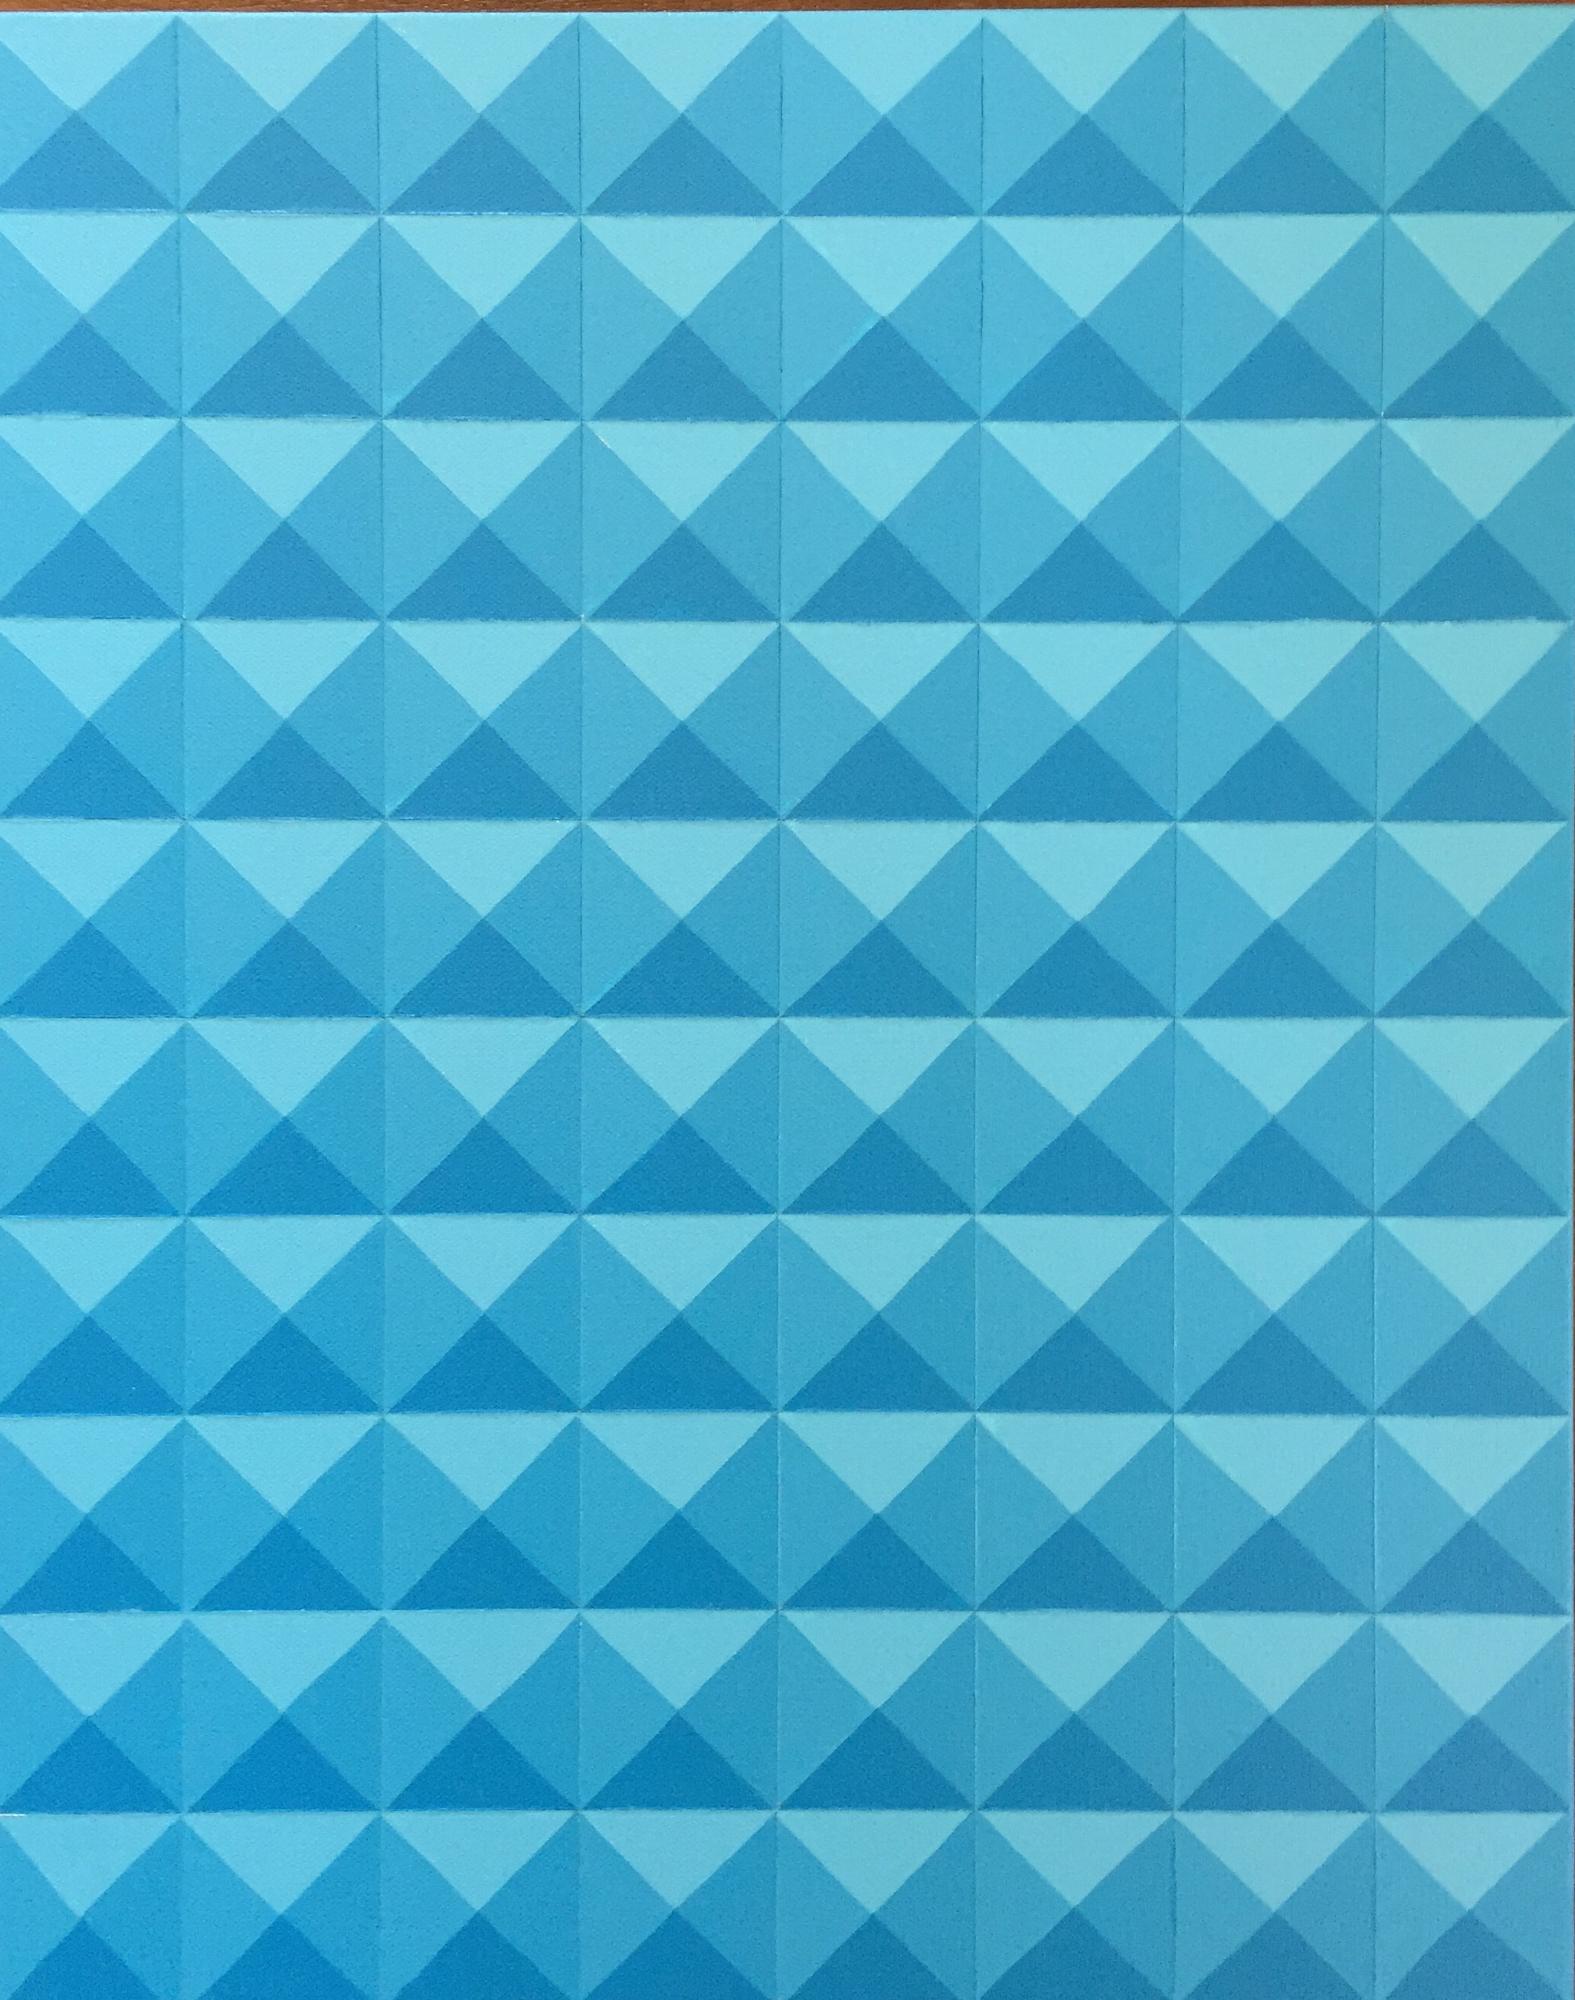 Light Blue Geometric